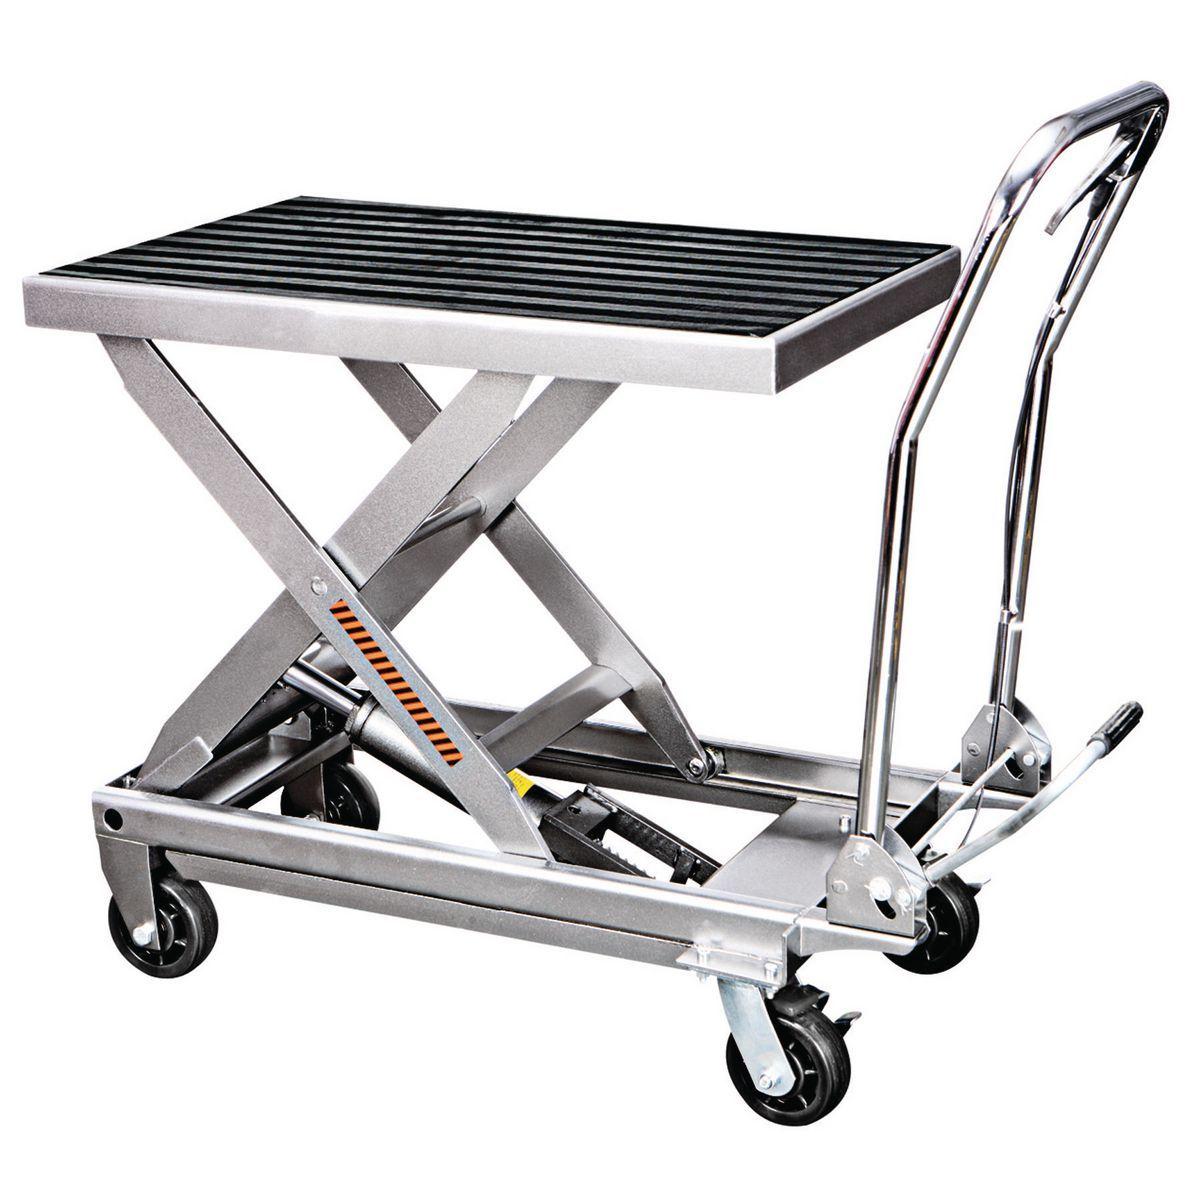 1000 lbs. Capacity Hydraulic Table Cart Wagon wheel